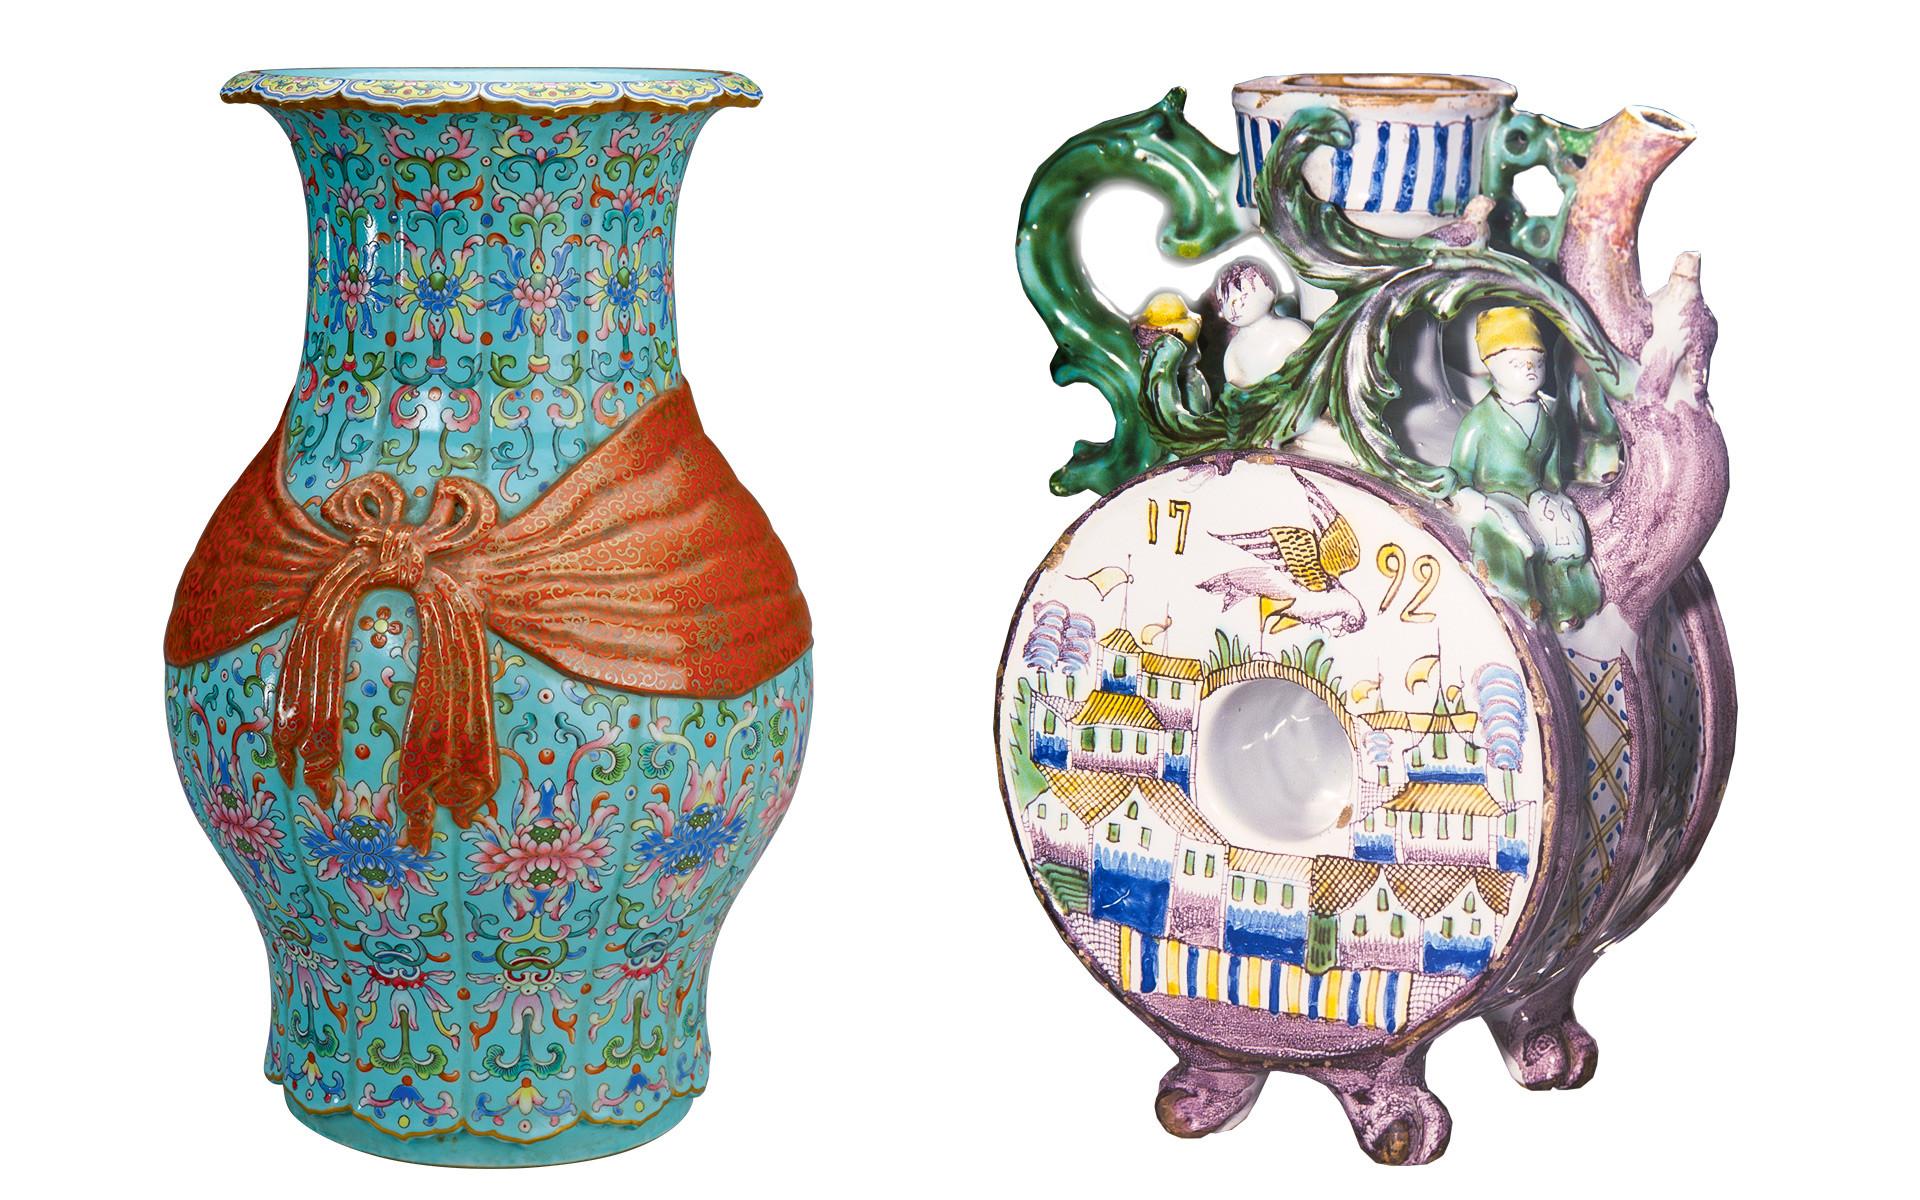 Lijevo: Baofu vaza. Dinastija Qing, vladavina Qianlonga (1736.–1796.) Desno: Testija. Majolika, XVIII. st. Izložba